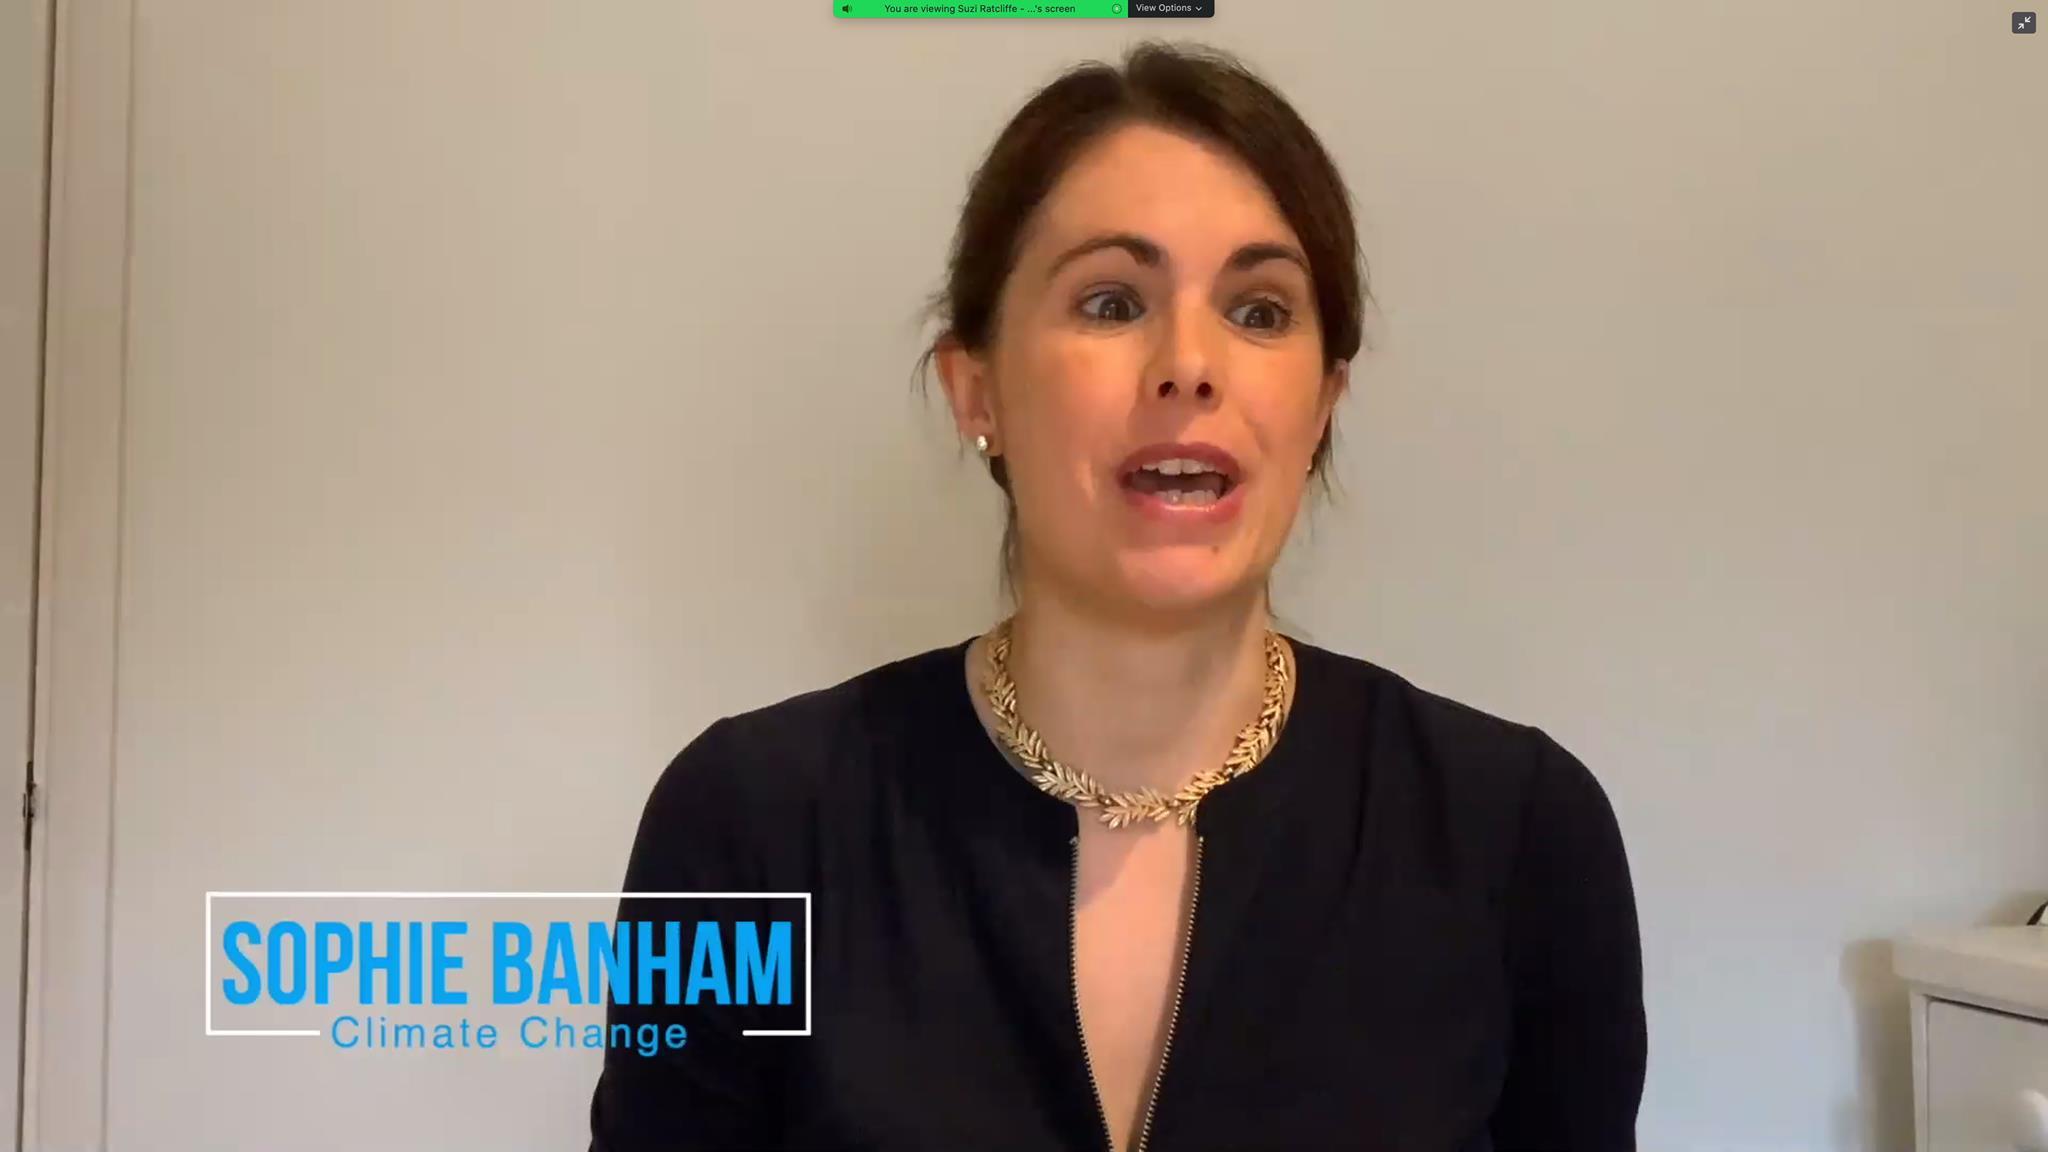 Sophie Banham seaker